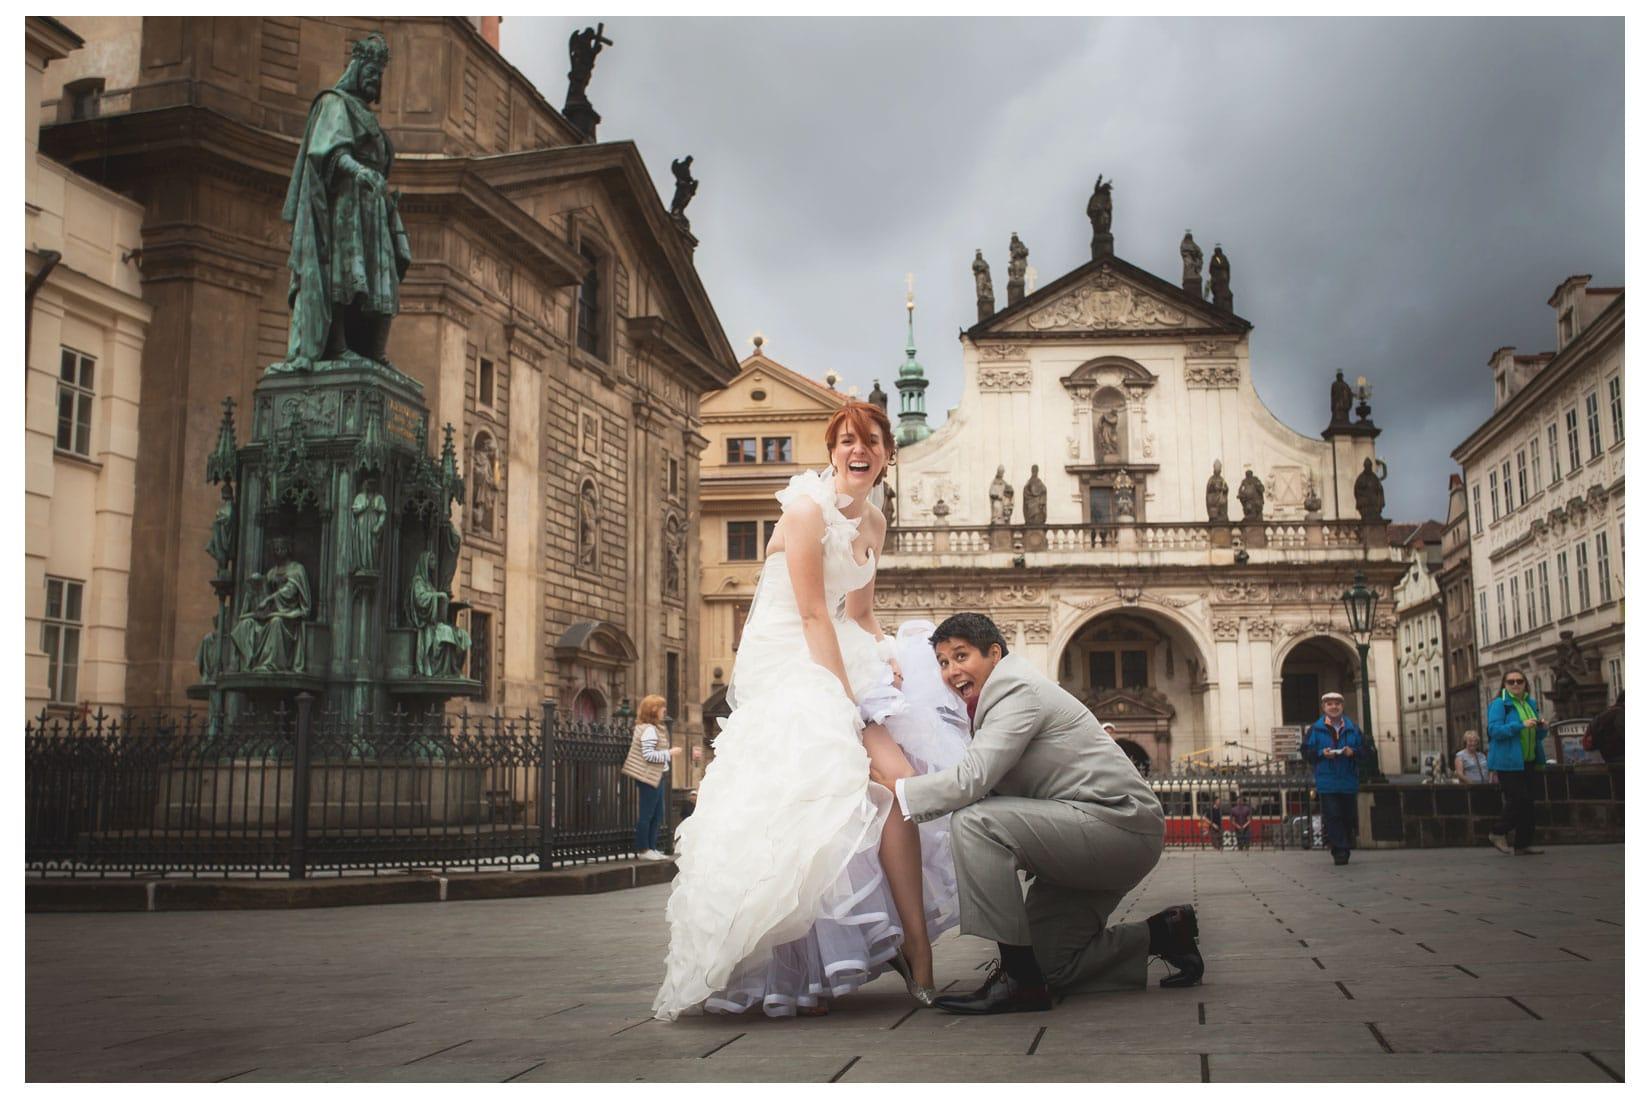 Charles Bridge Wedding / Kimberly & Jules / Charles Bridge portraits